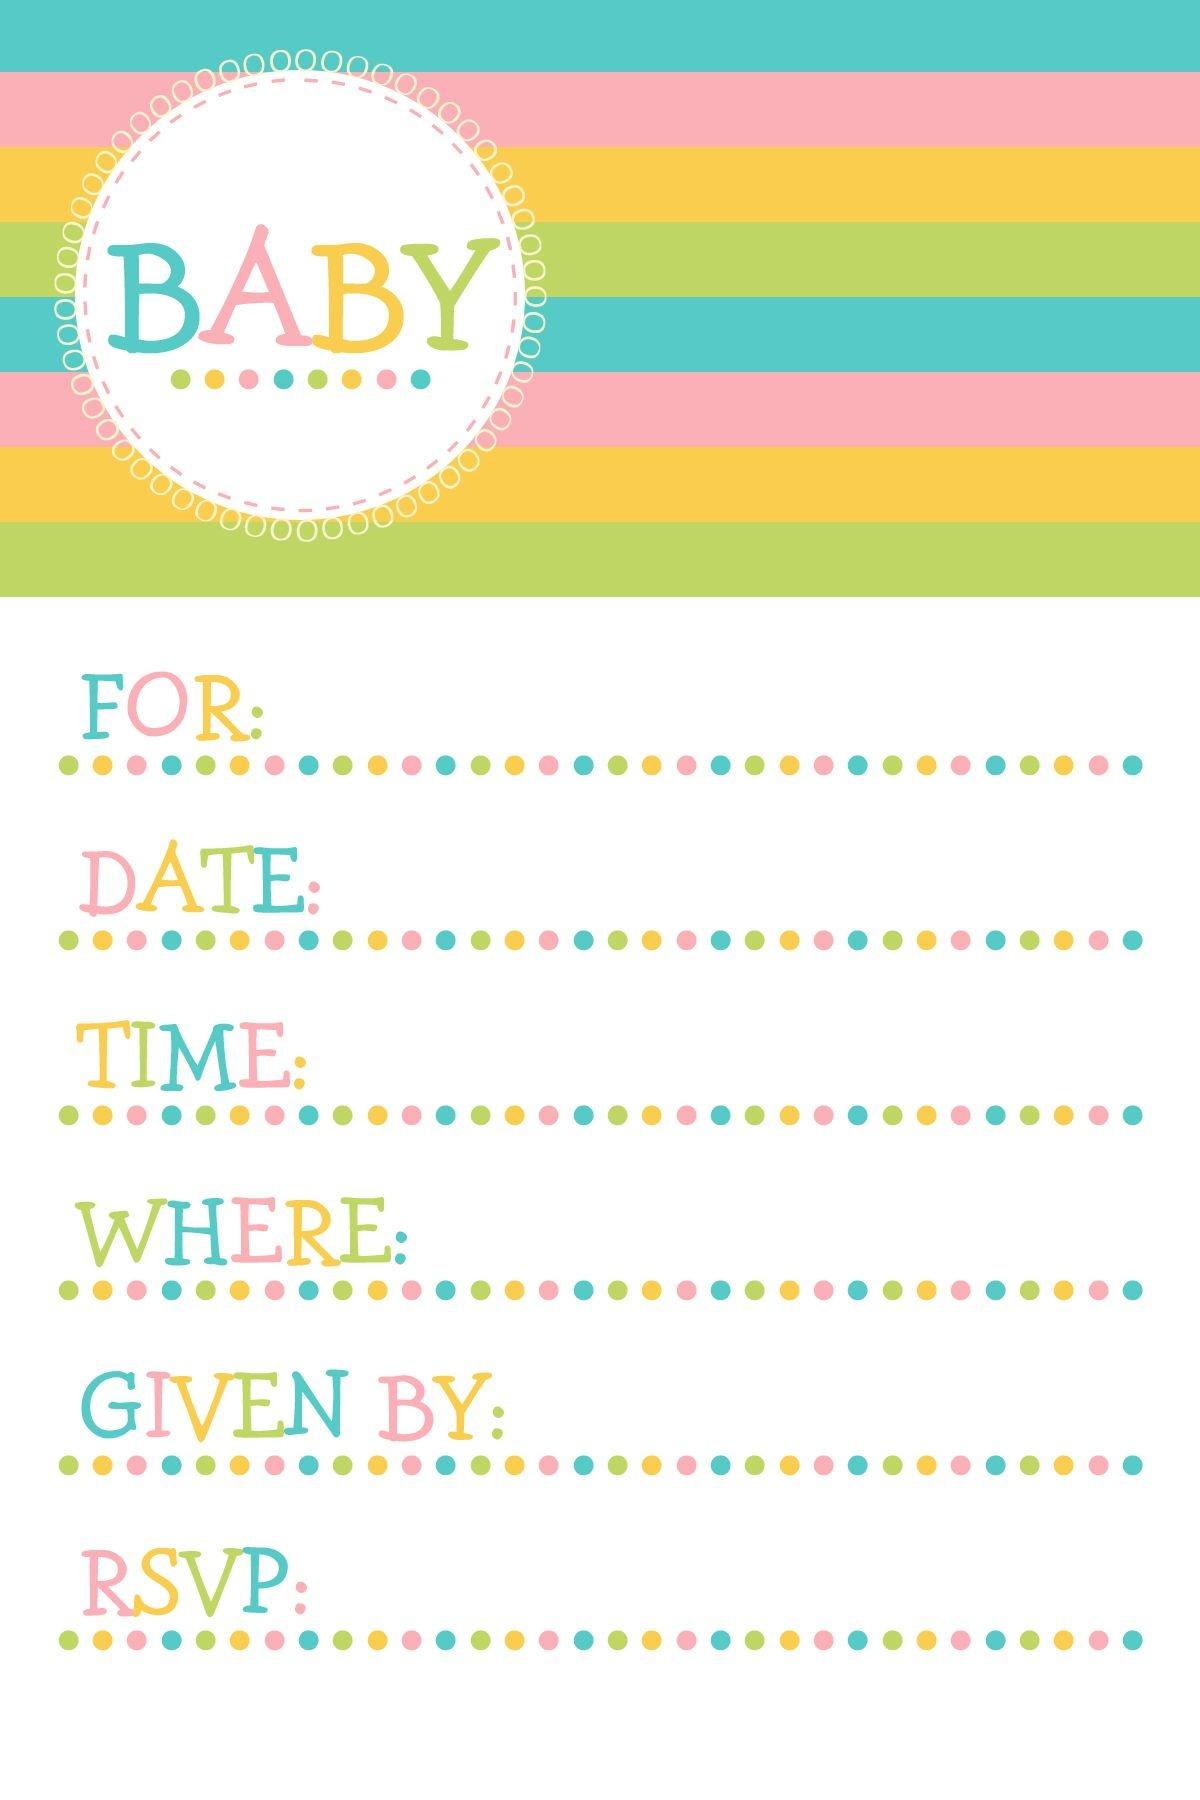 25 Adorable Free Printable Baby Shower Invitations - Free Stork Party Invitations Printable